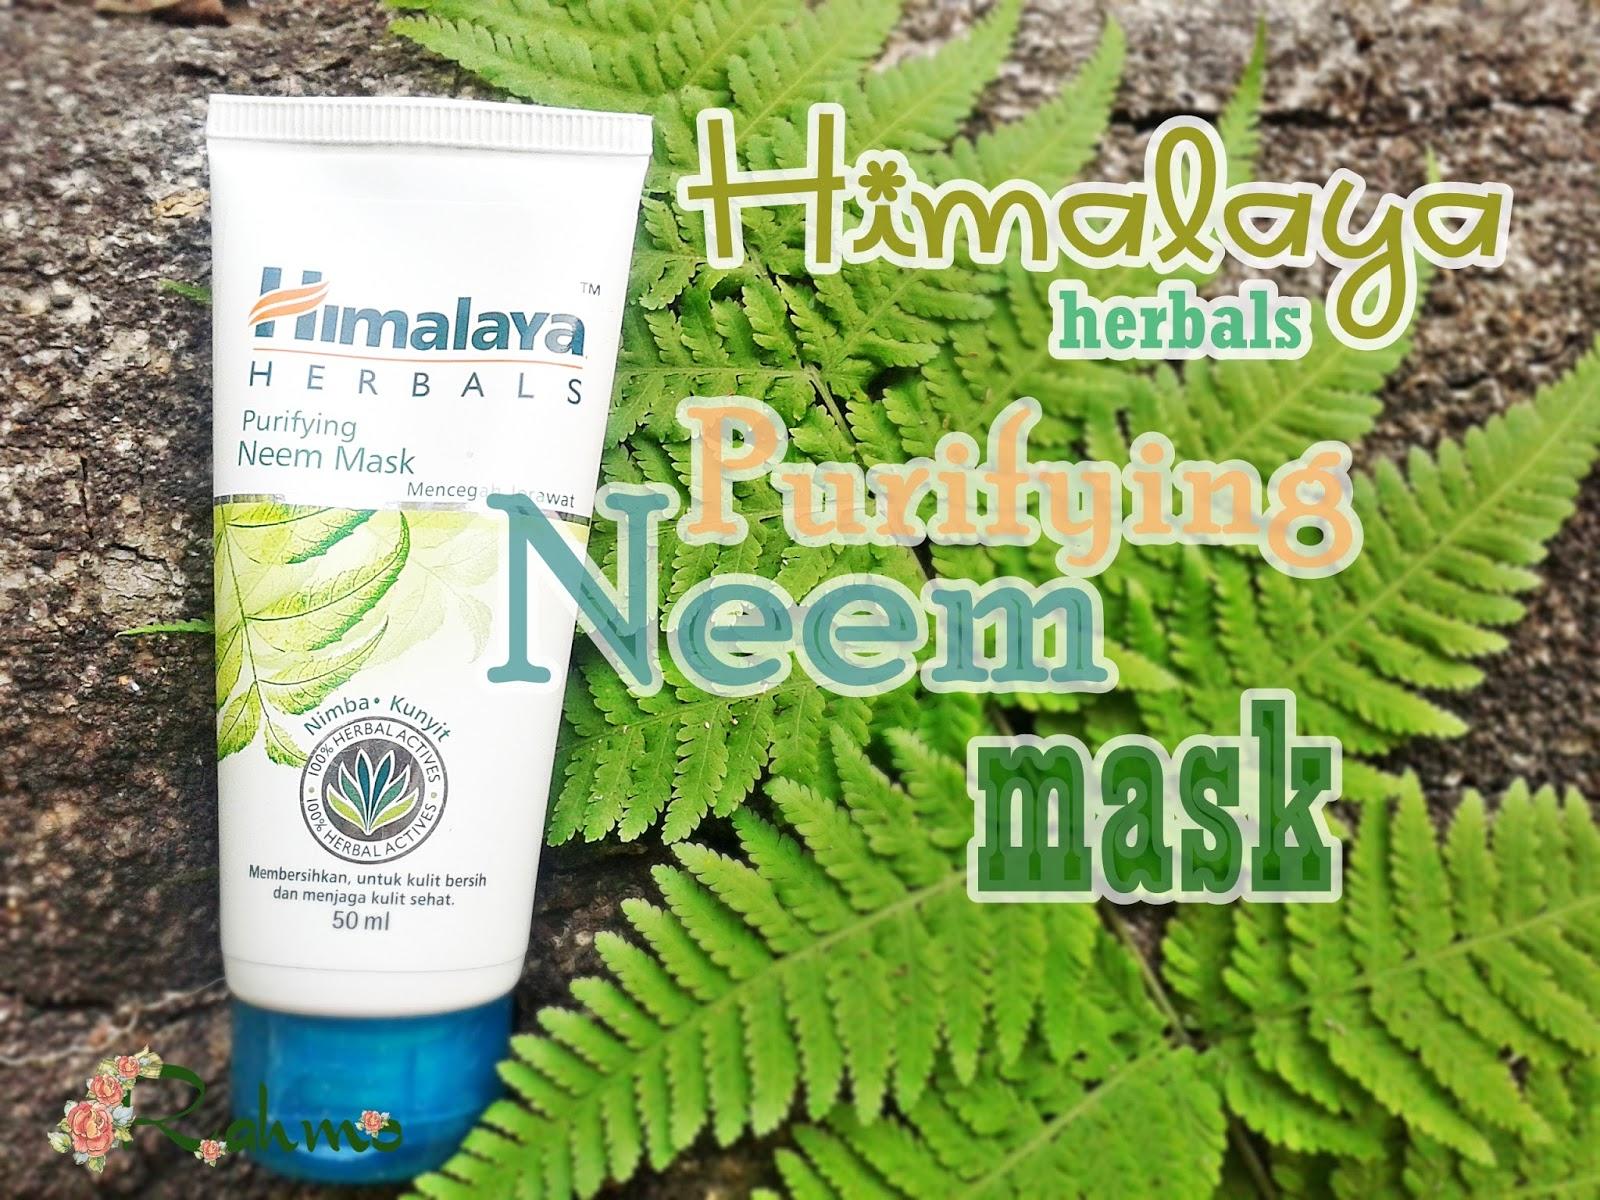 Himalaya Herbals Purifying Neem Mask Review Rahma Brilianita